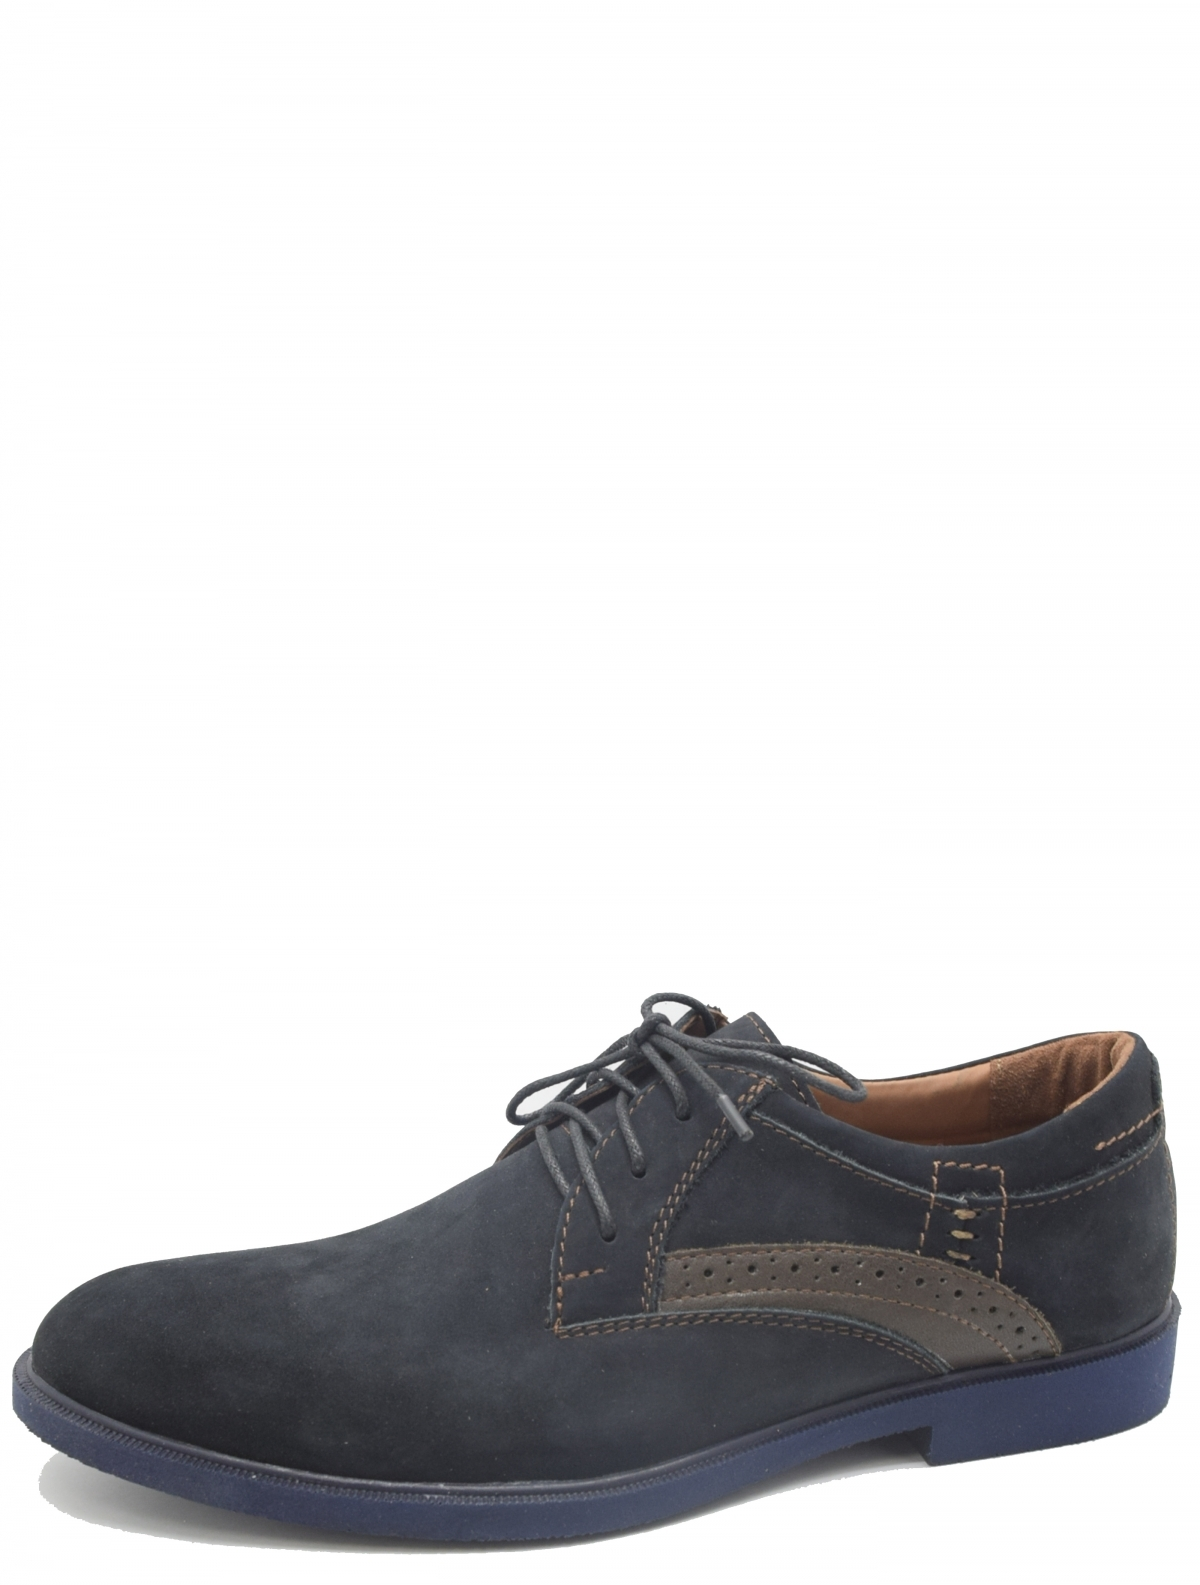 Baratto 1-326-201-1 мужские туфли